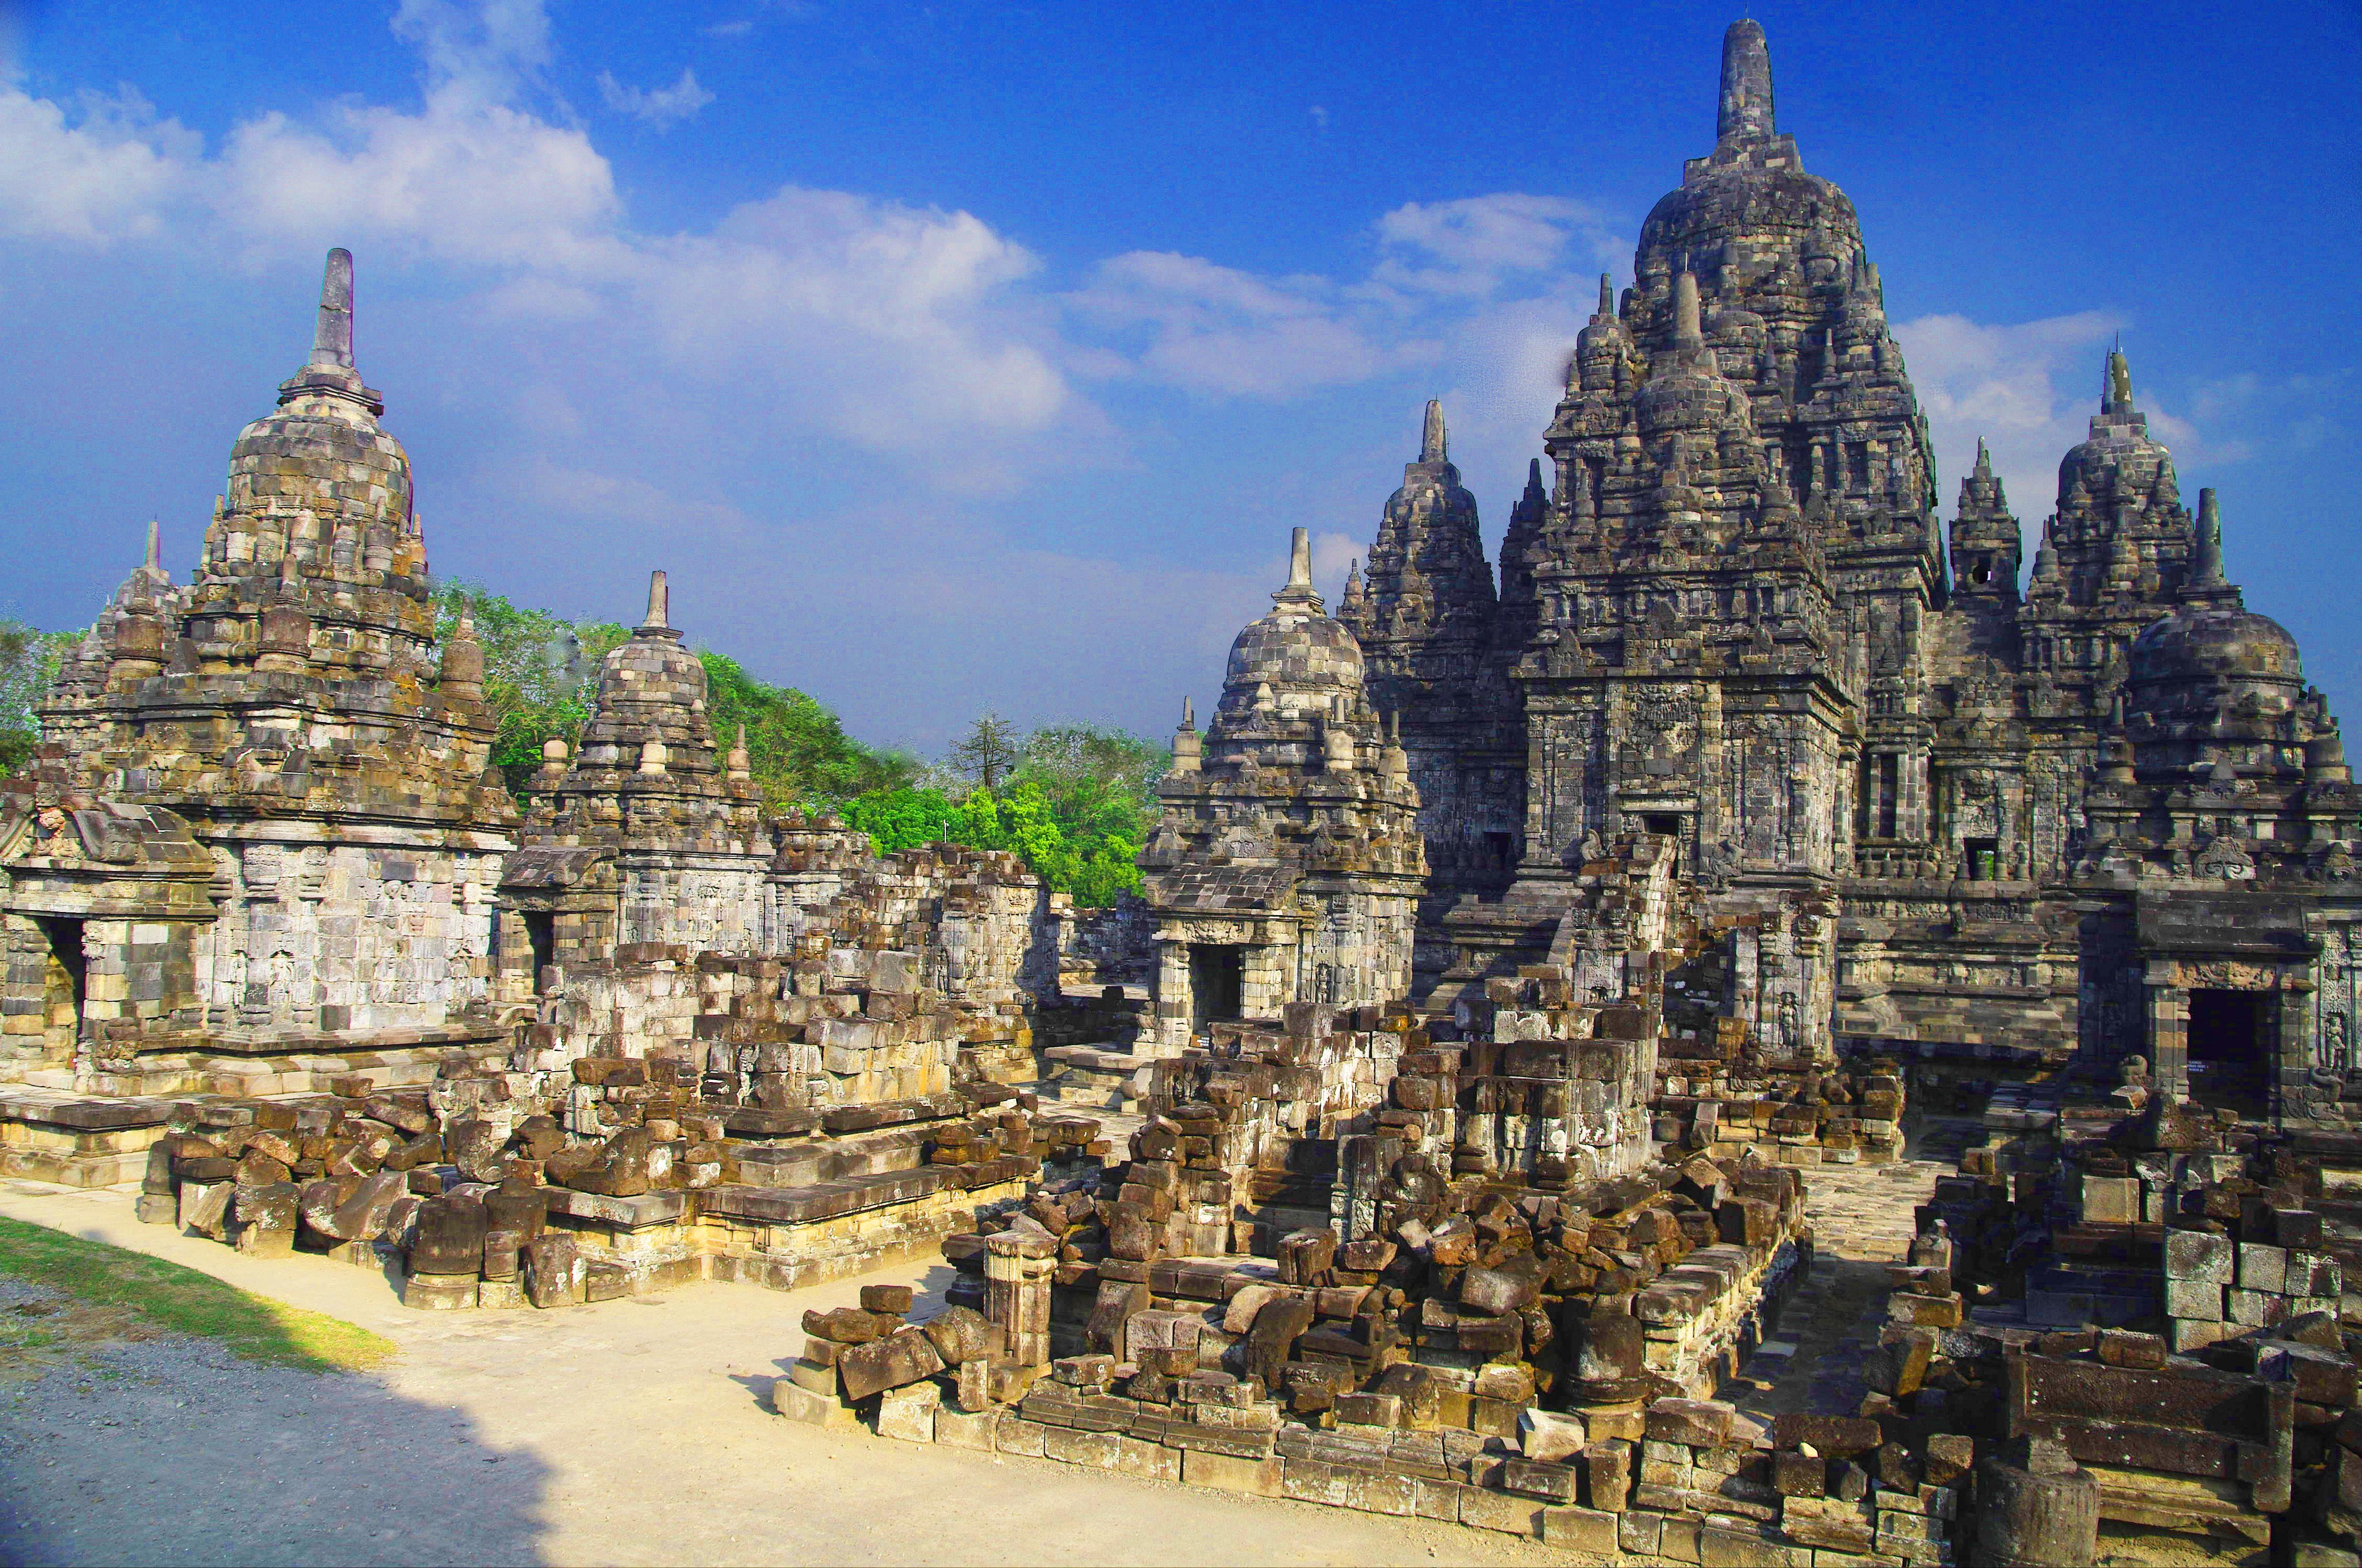 Templos de Prambanam, Indonésia